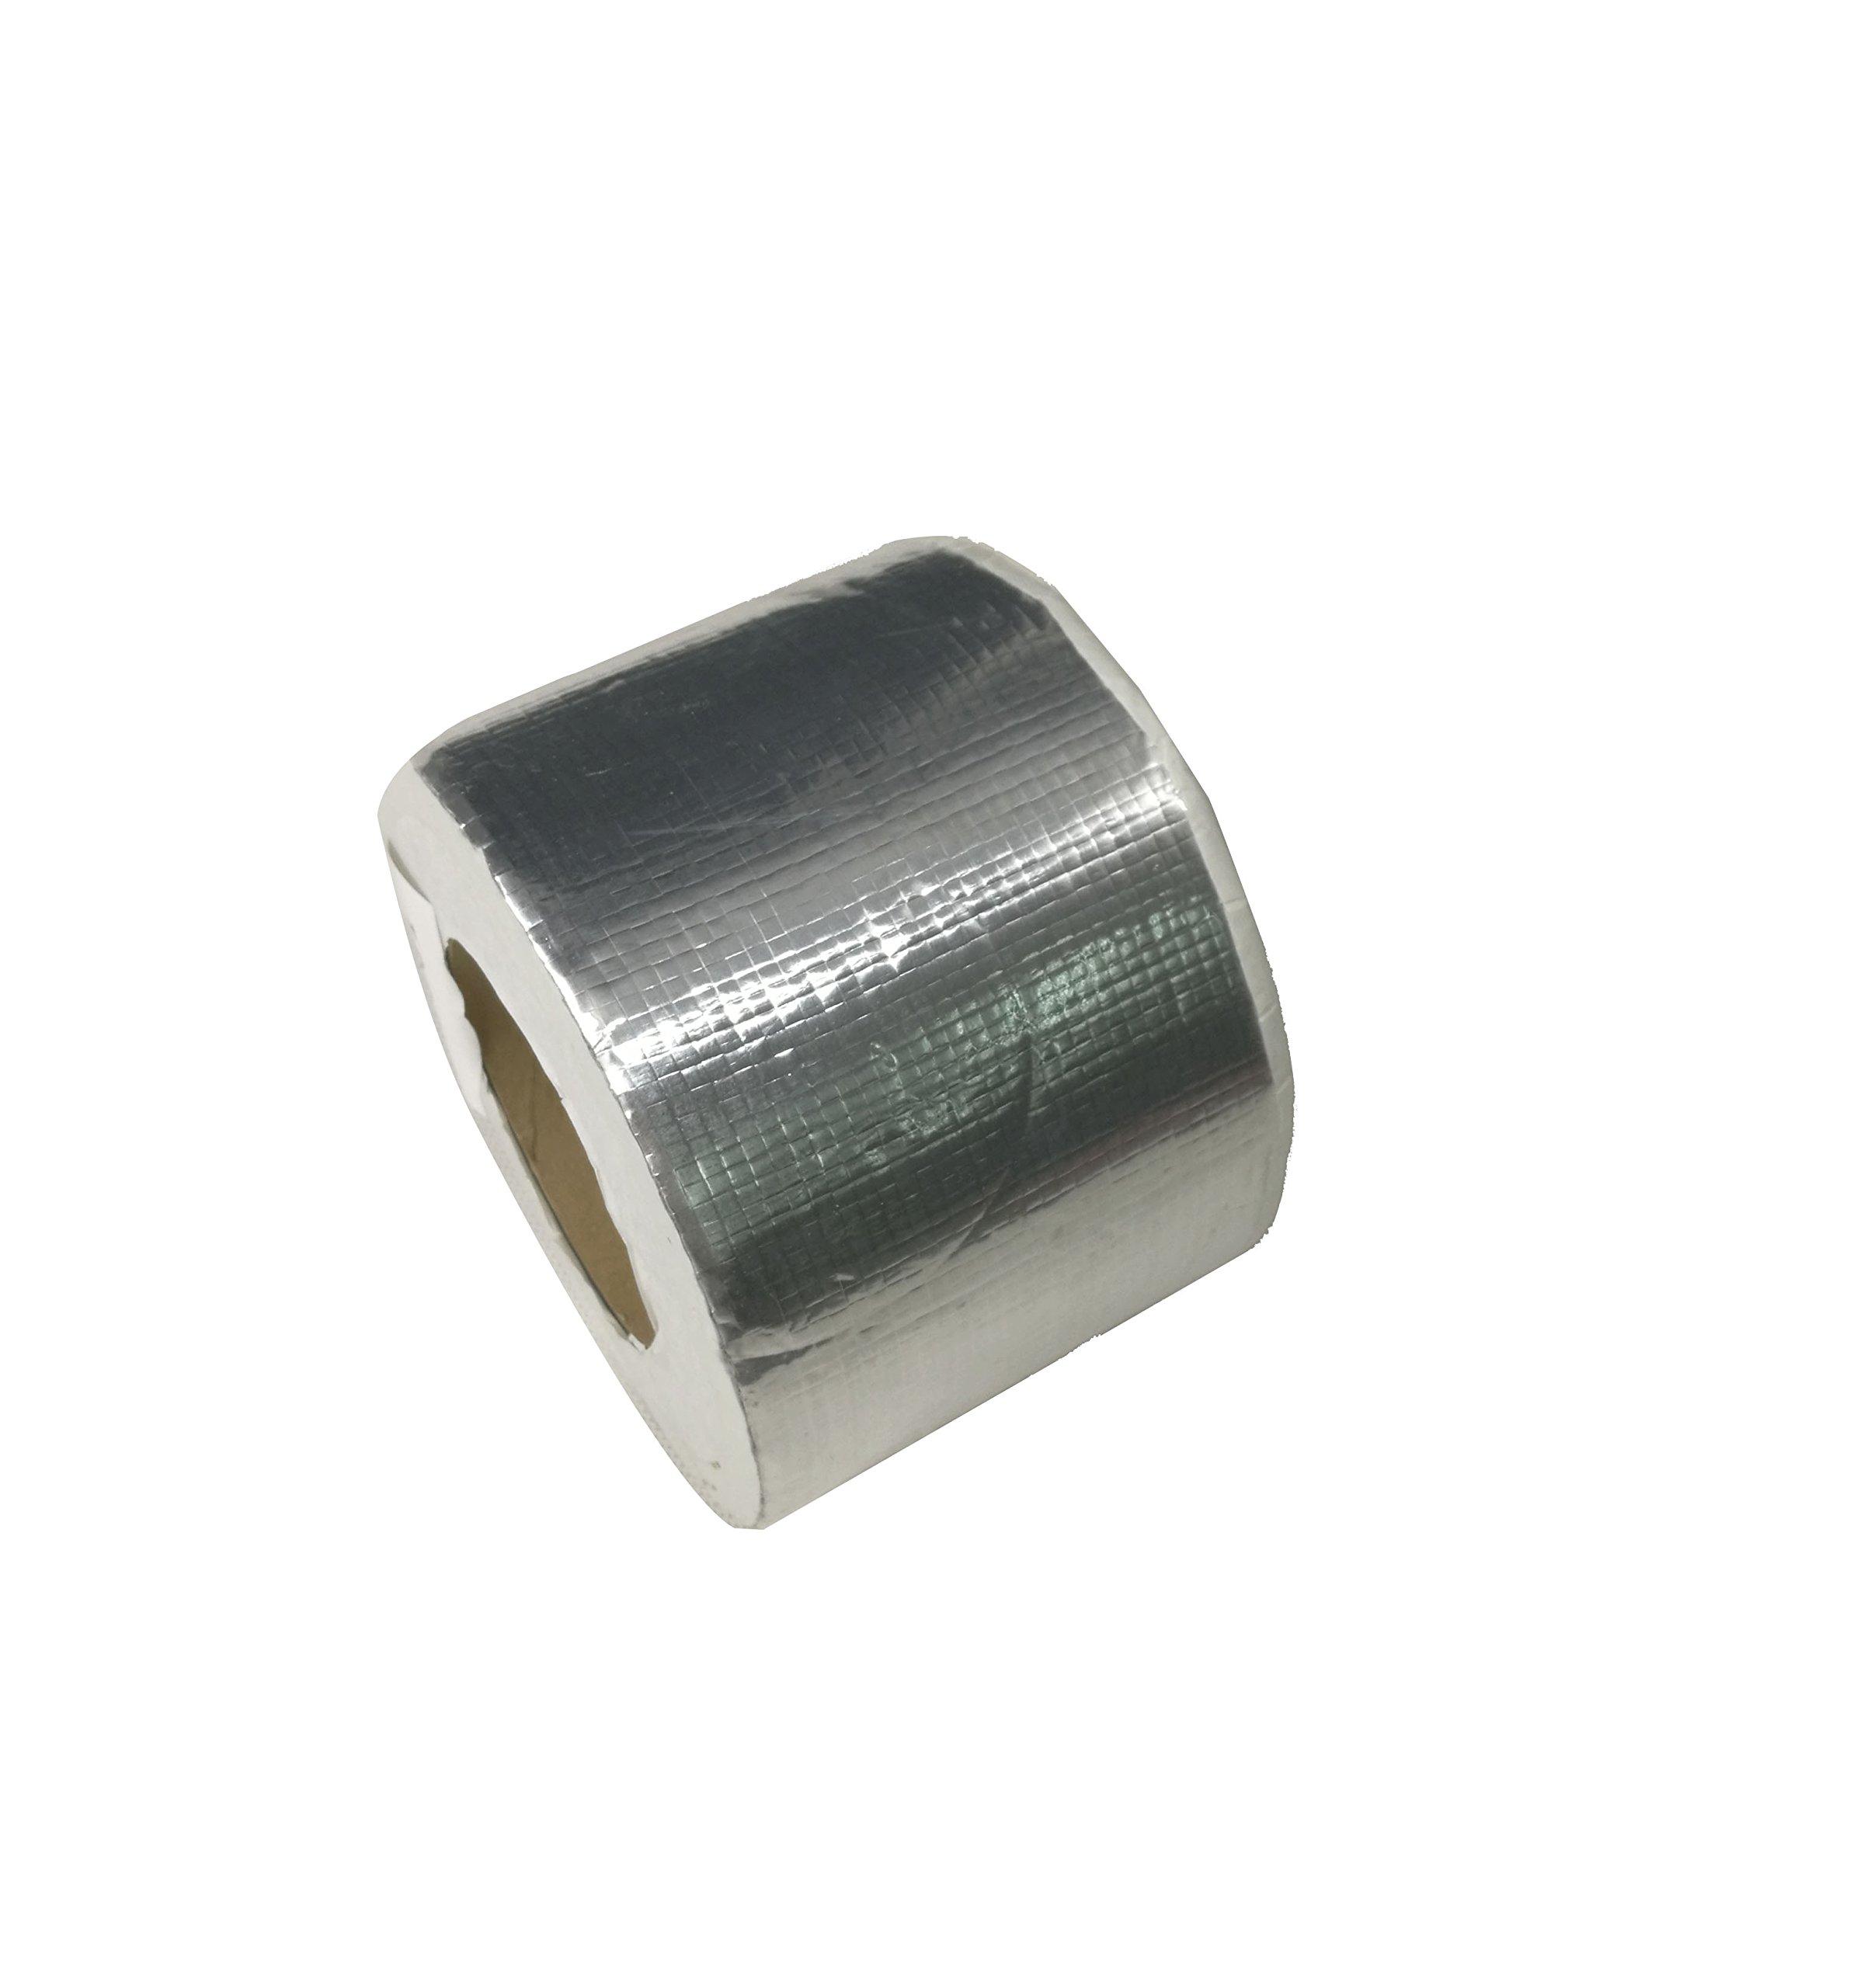 FixtureDisplays Butyl Seal Tape, RV Roof Repair Tape Marine Rubber Seal Tape Covered with Aluminium Foil (4'' Width x 32.8' Length) 15301-NPF